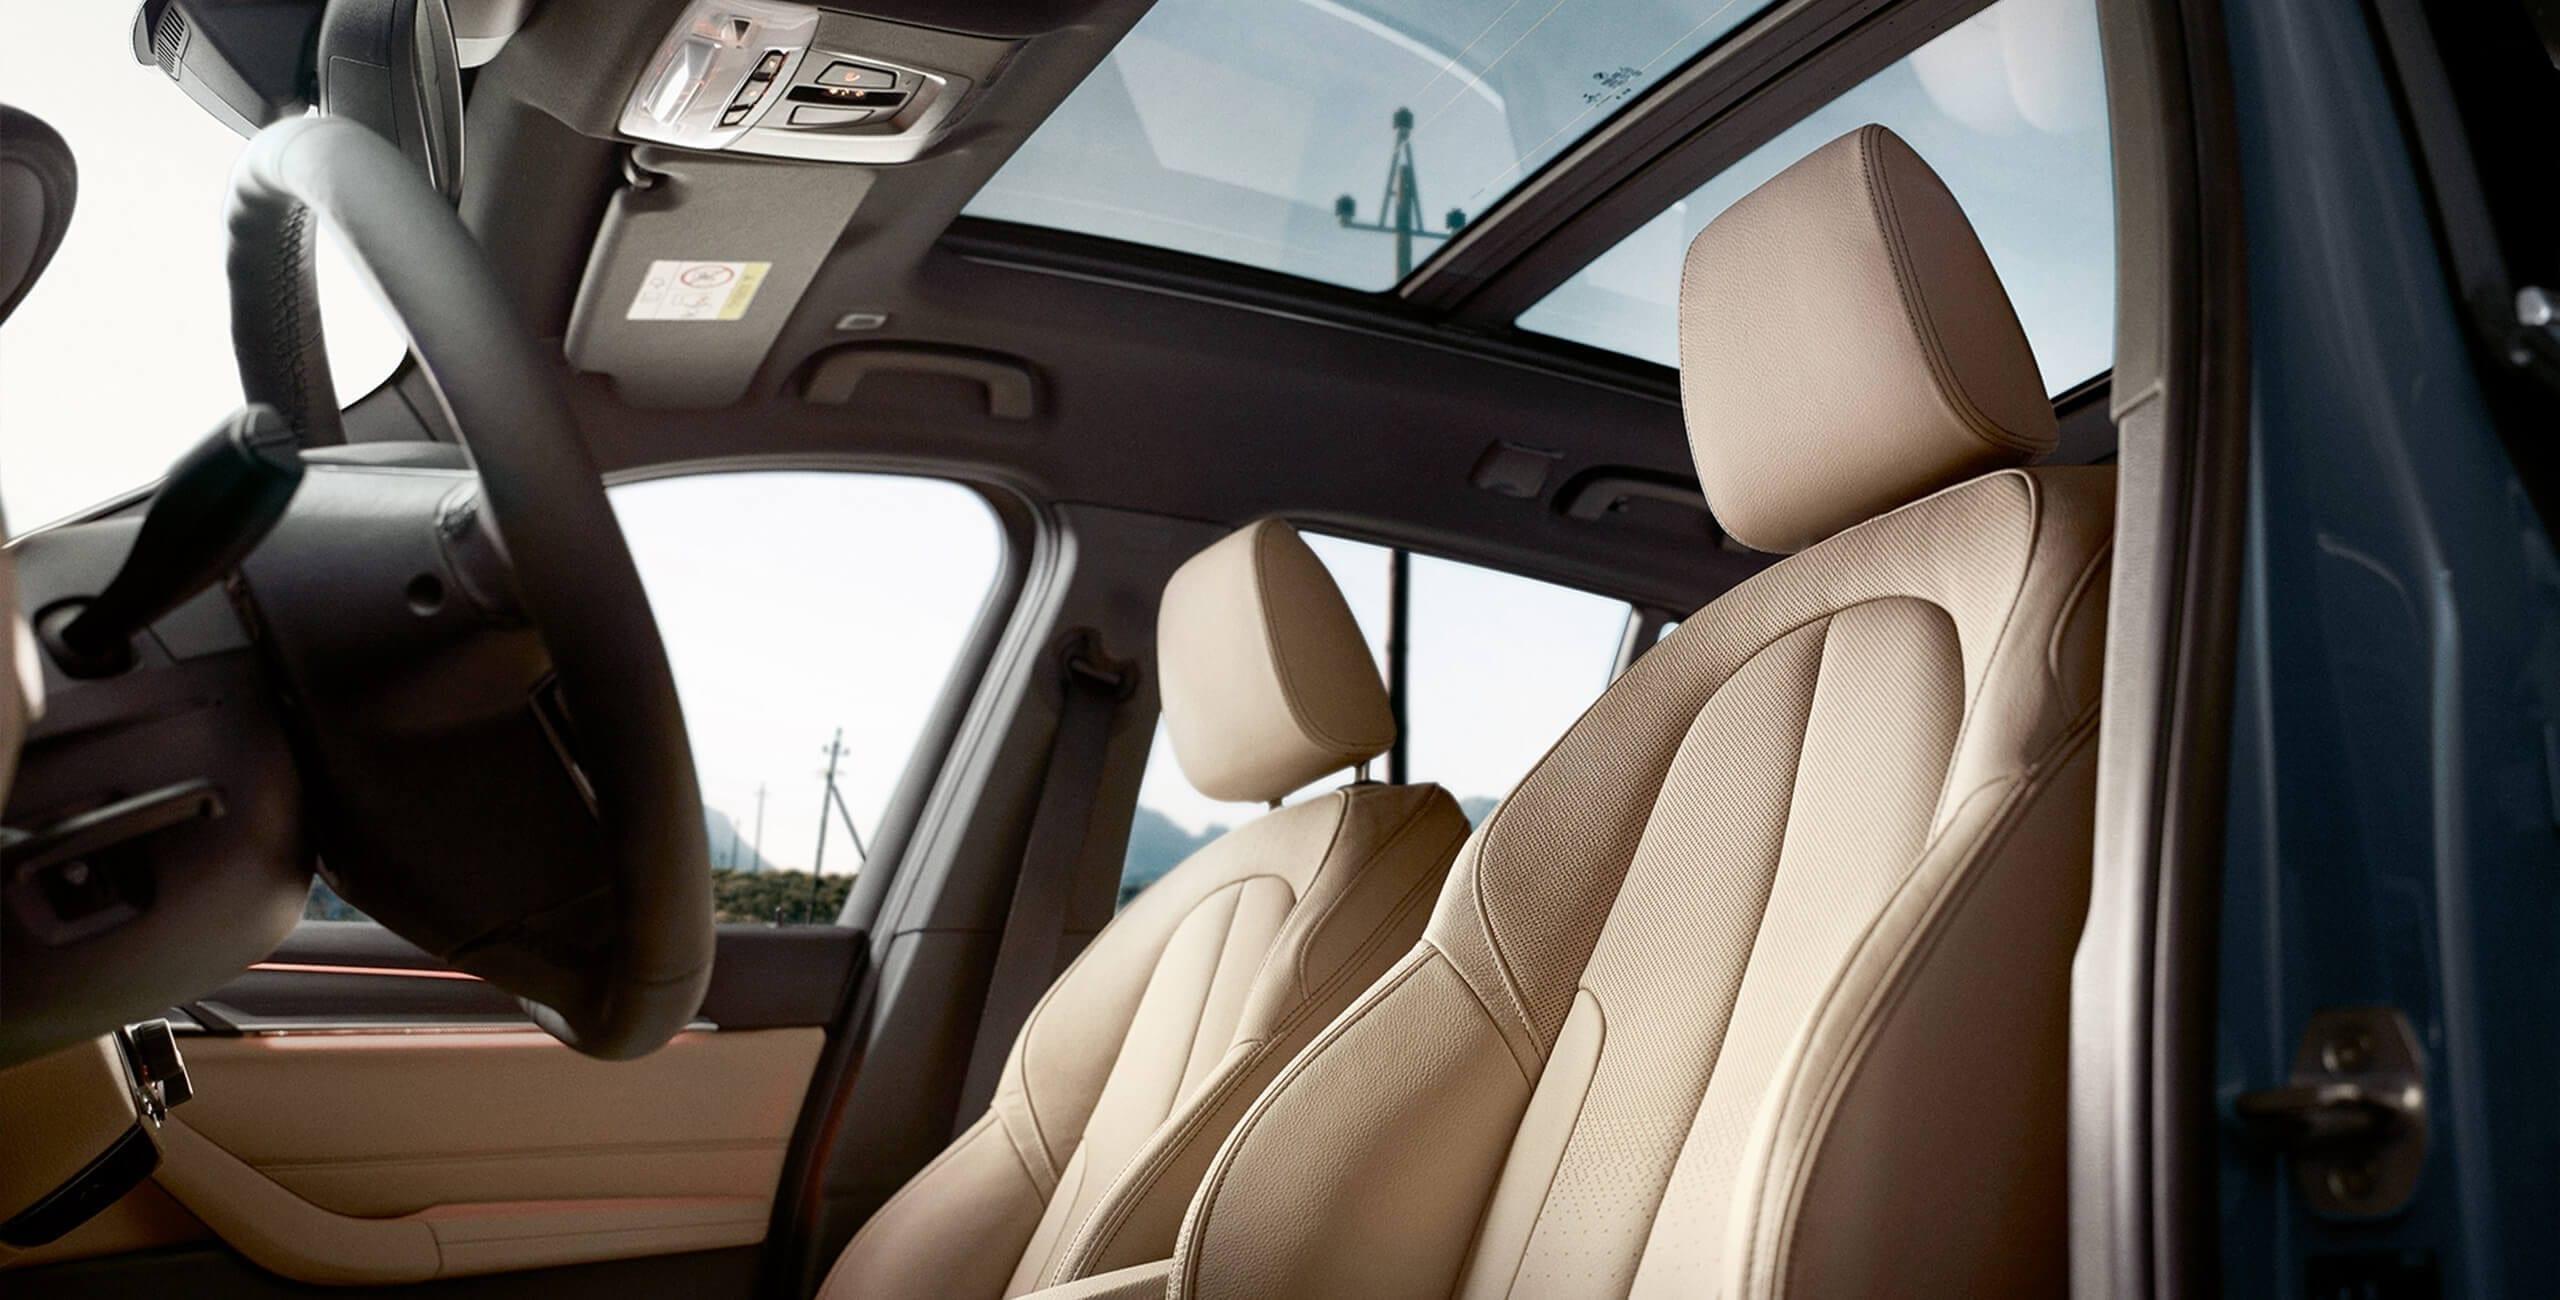 BMW X1 VDL Nedcar Edition